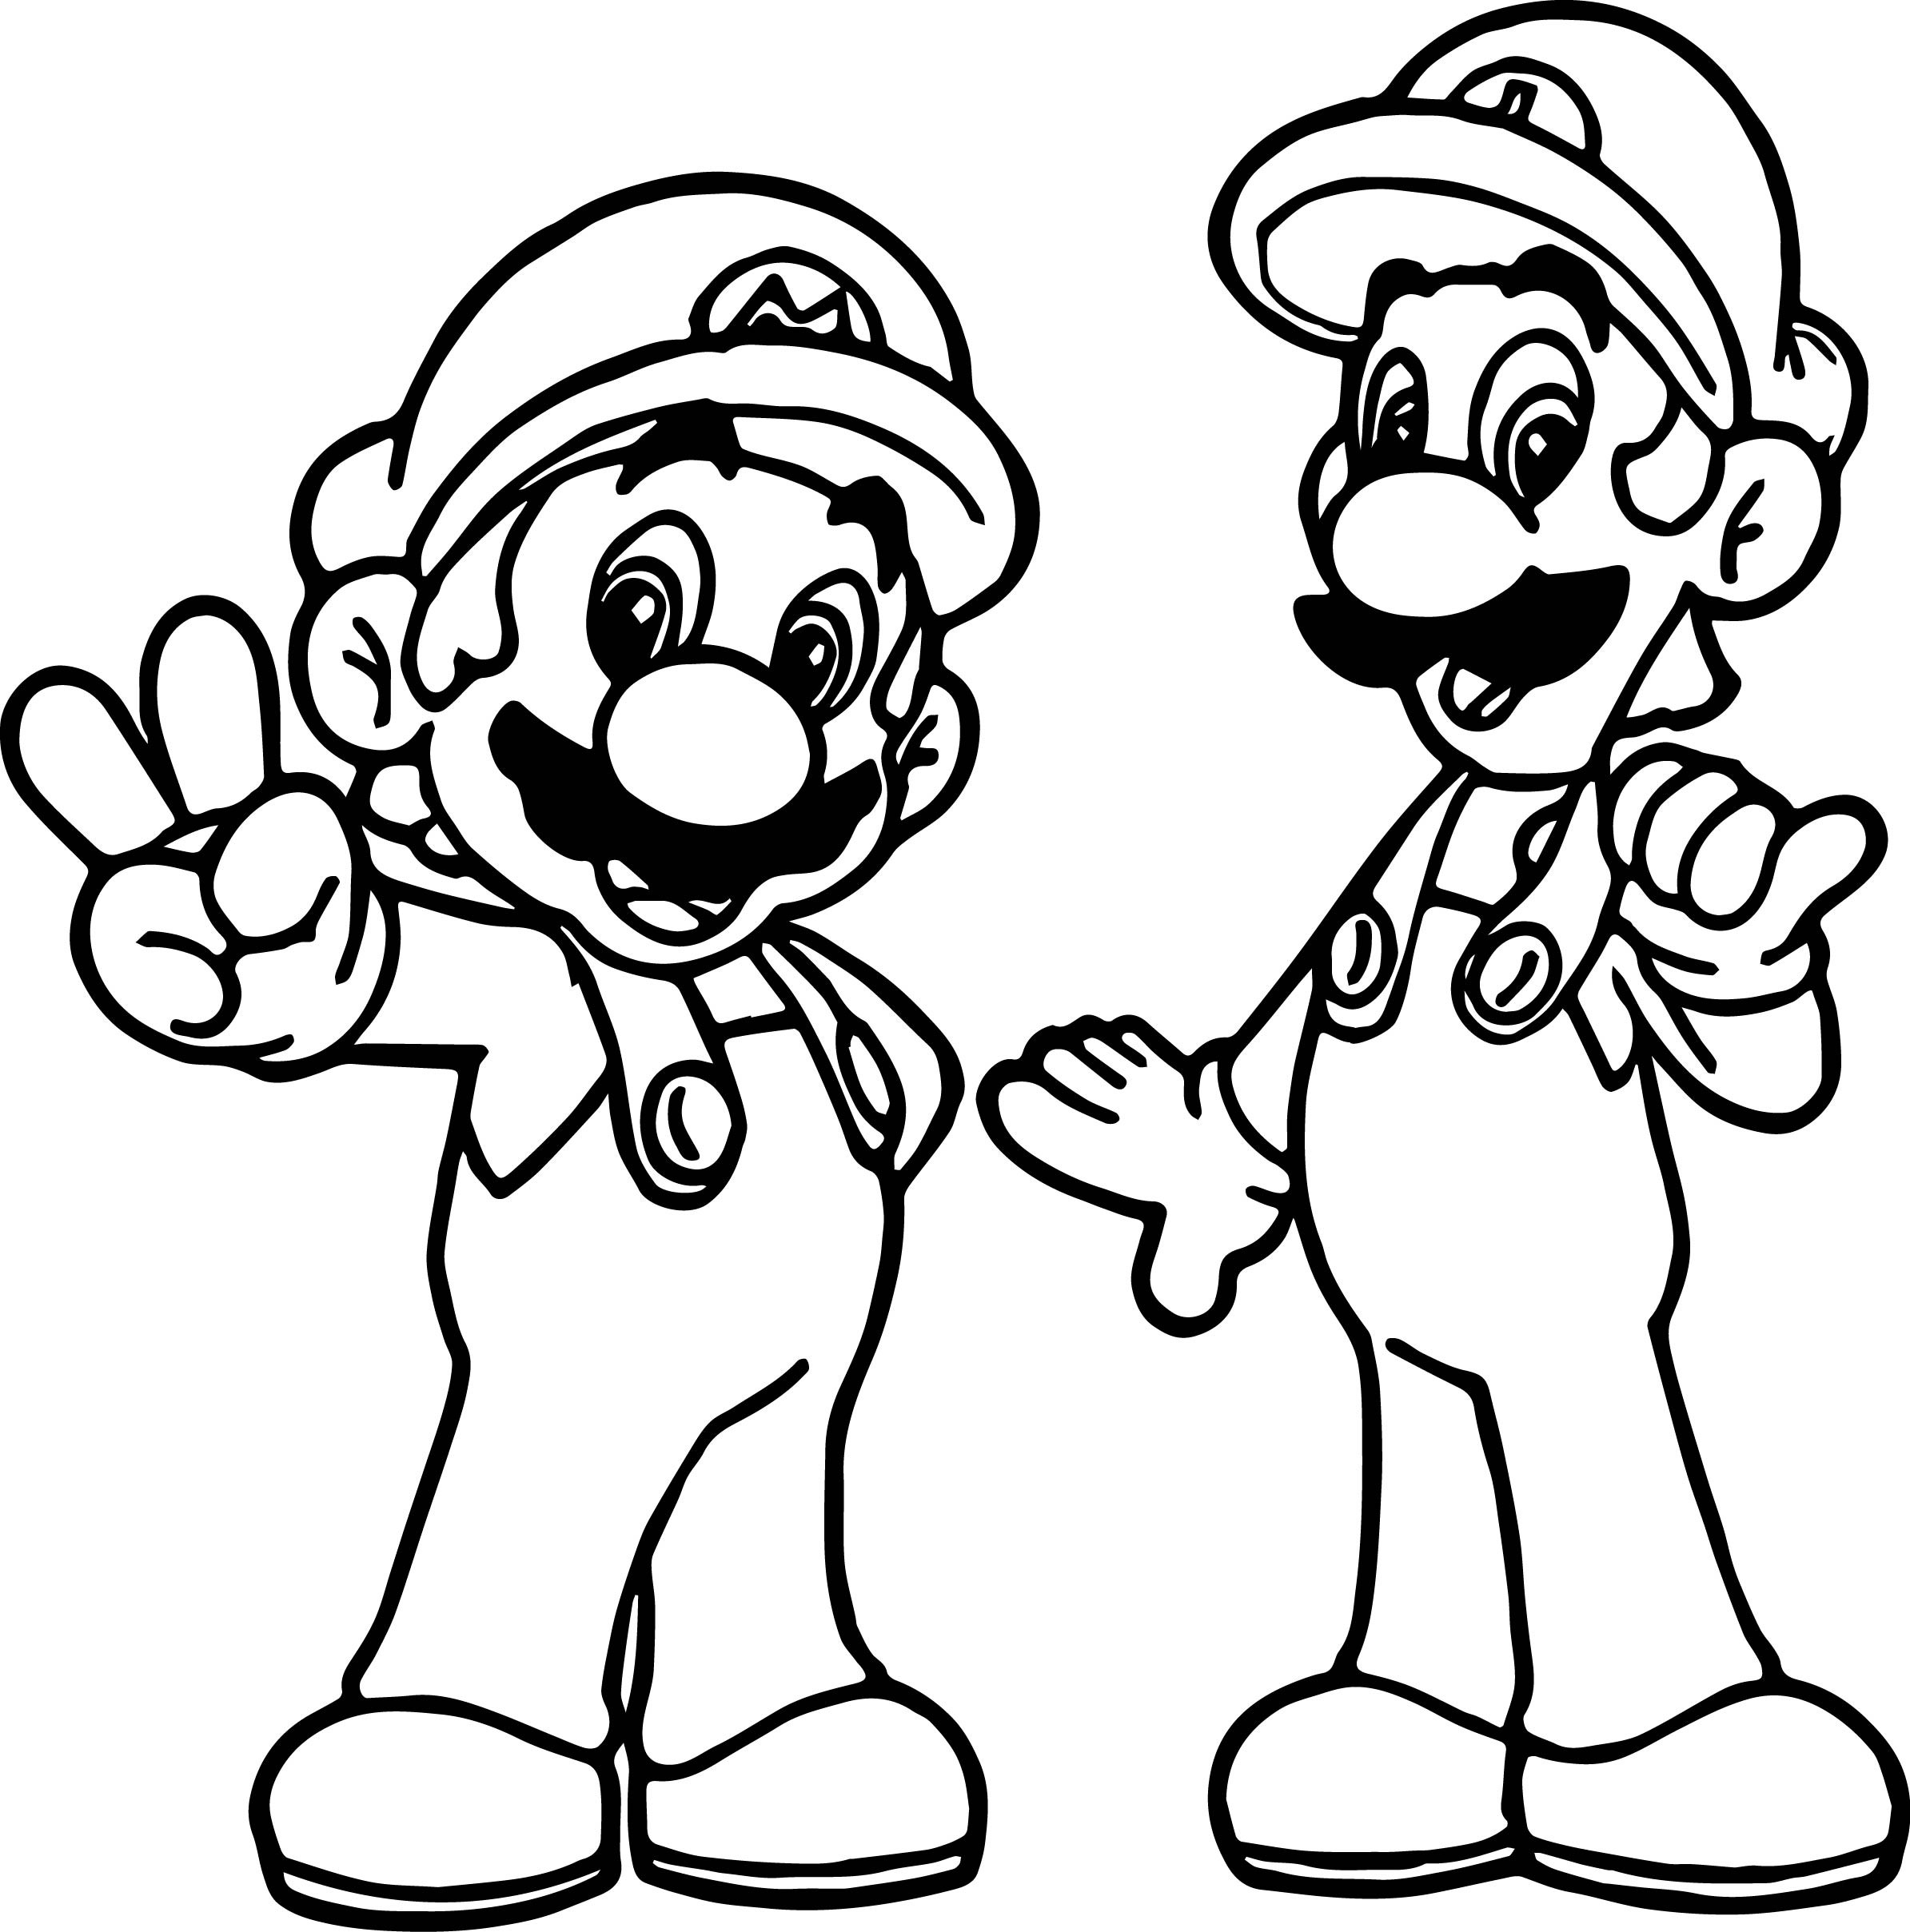 Mario Mushroom Drawing at GetDrawings